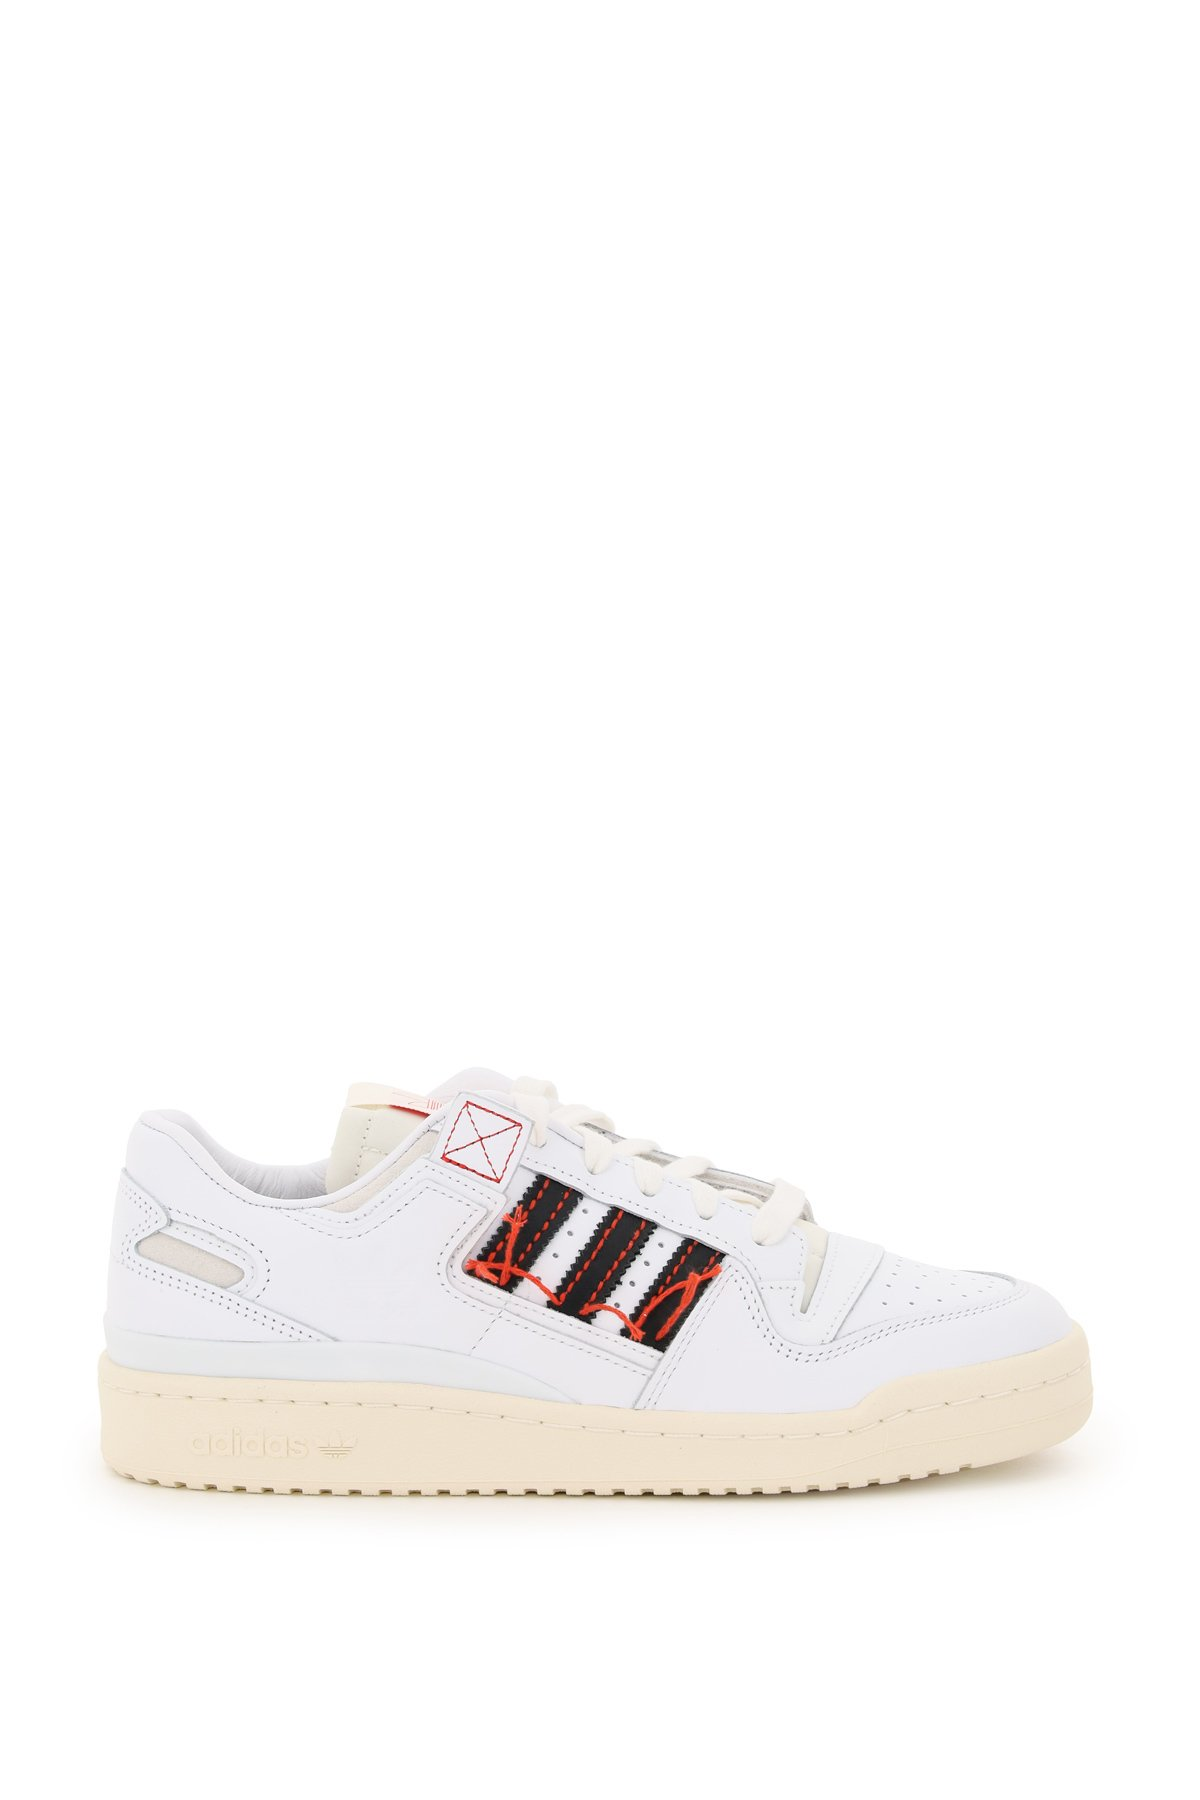 Adidas sneakers forum 84 low premium